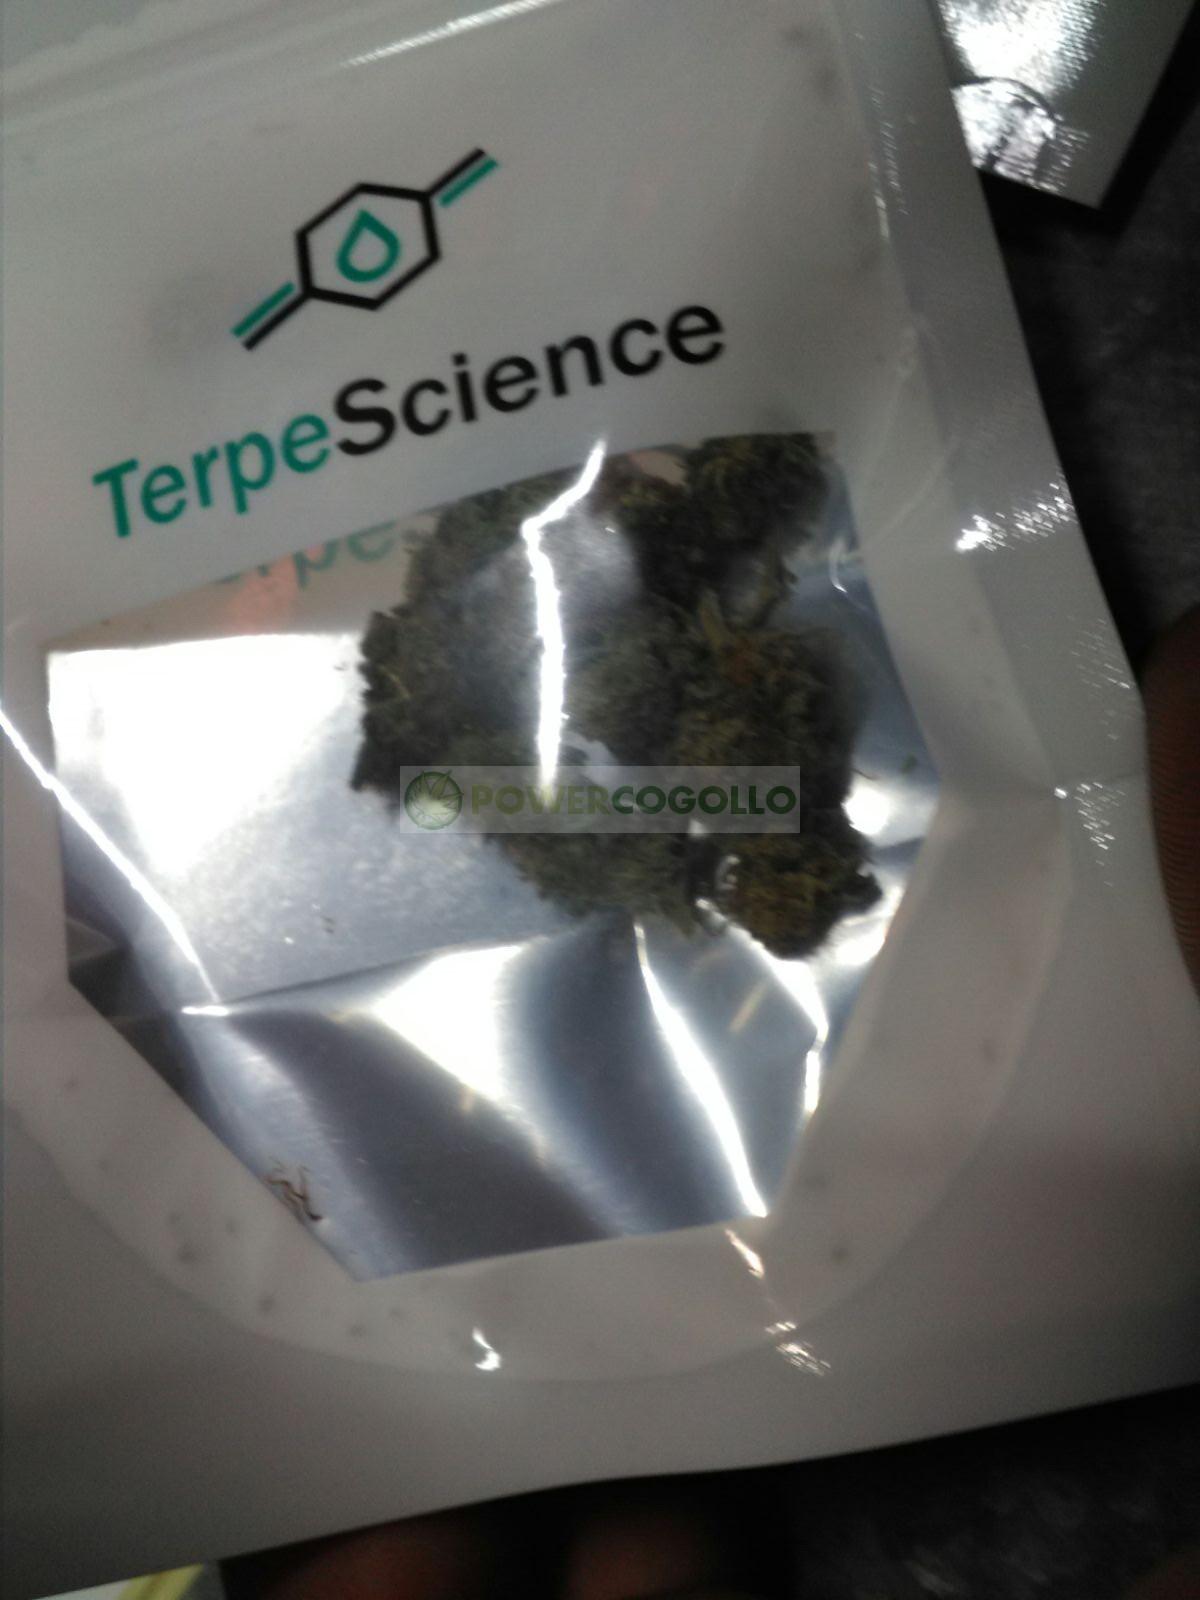 Flores CBD (TerpeScience) 4